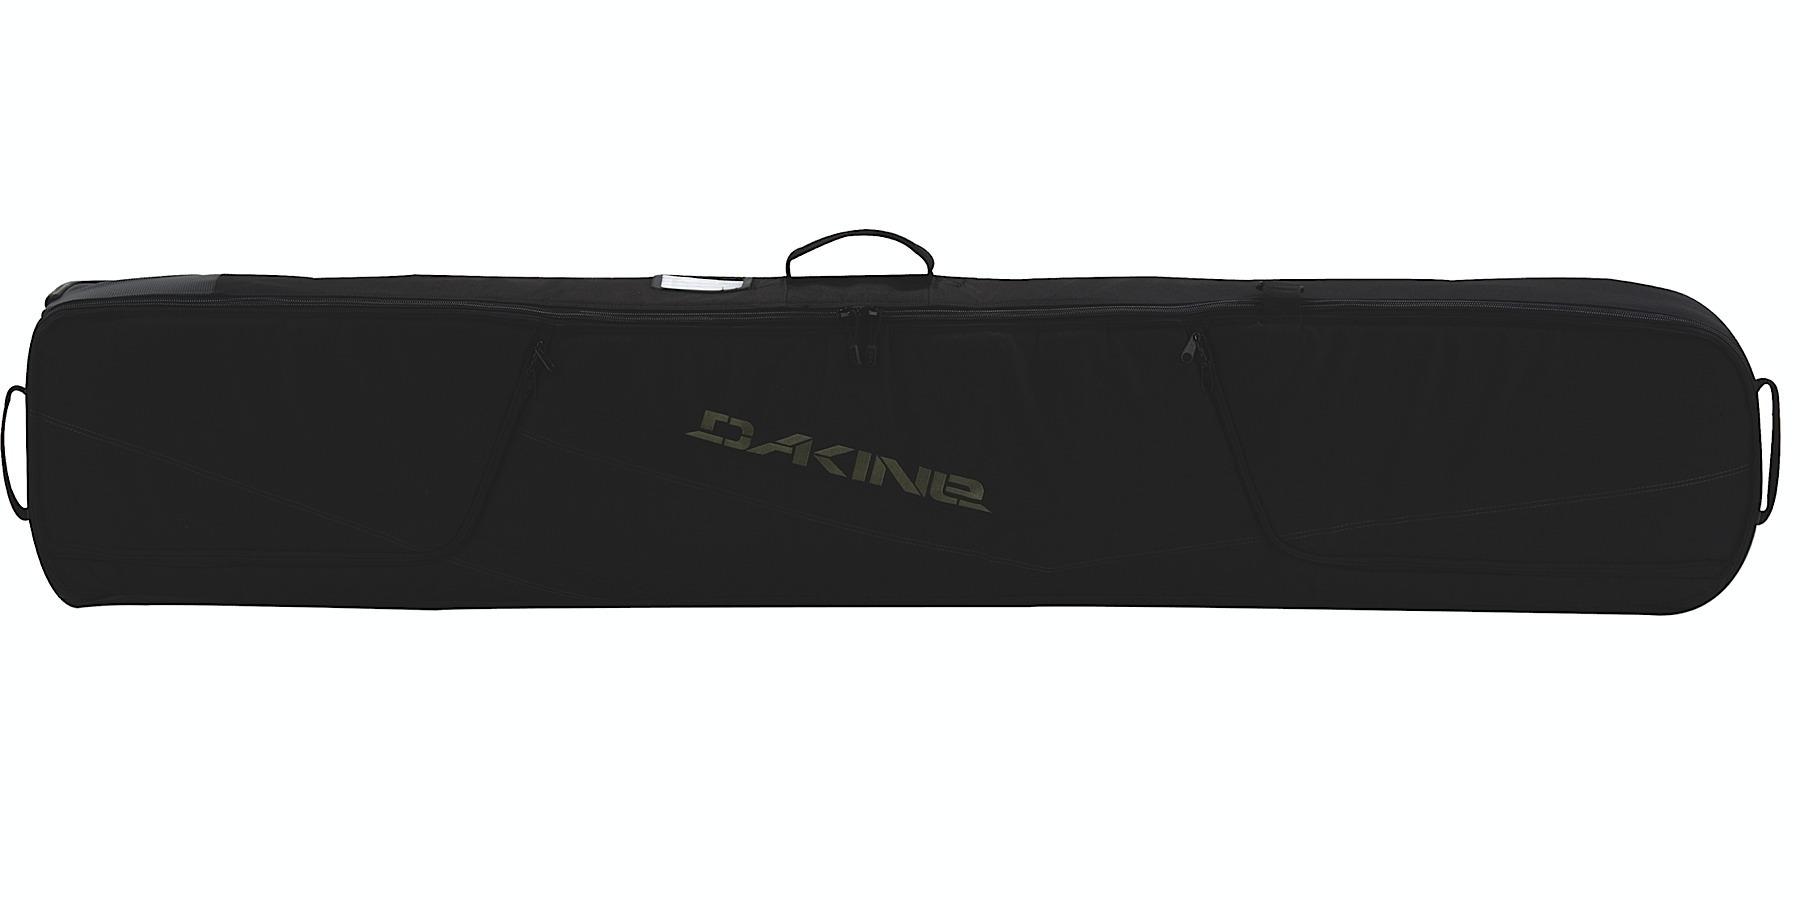 ЧЕХЛЫ Чехол для сноуборда Dakine Low Roller 157Cm Black 1600440_001_LOWROLLER_BLACK.jpg